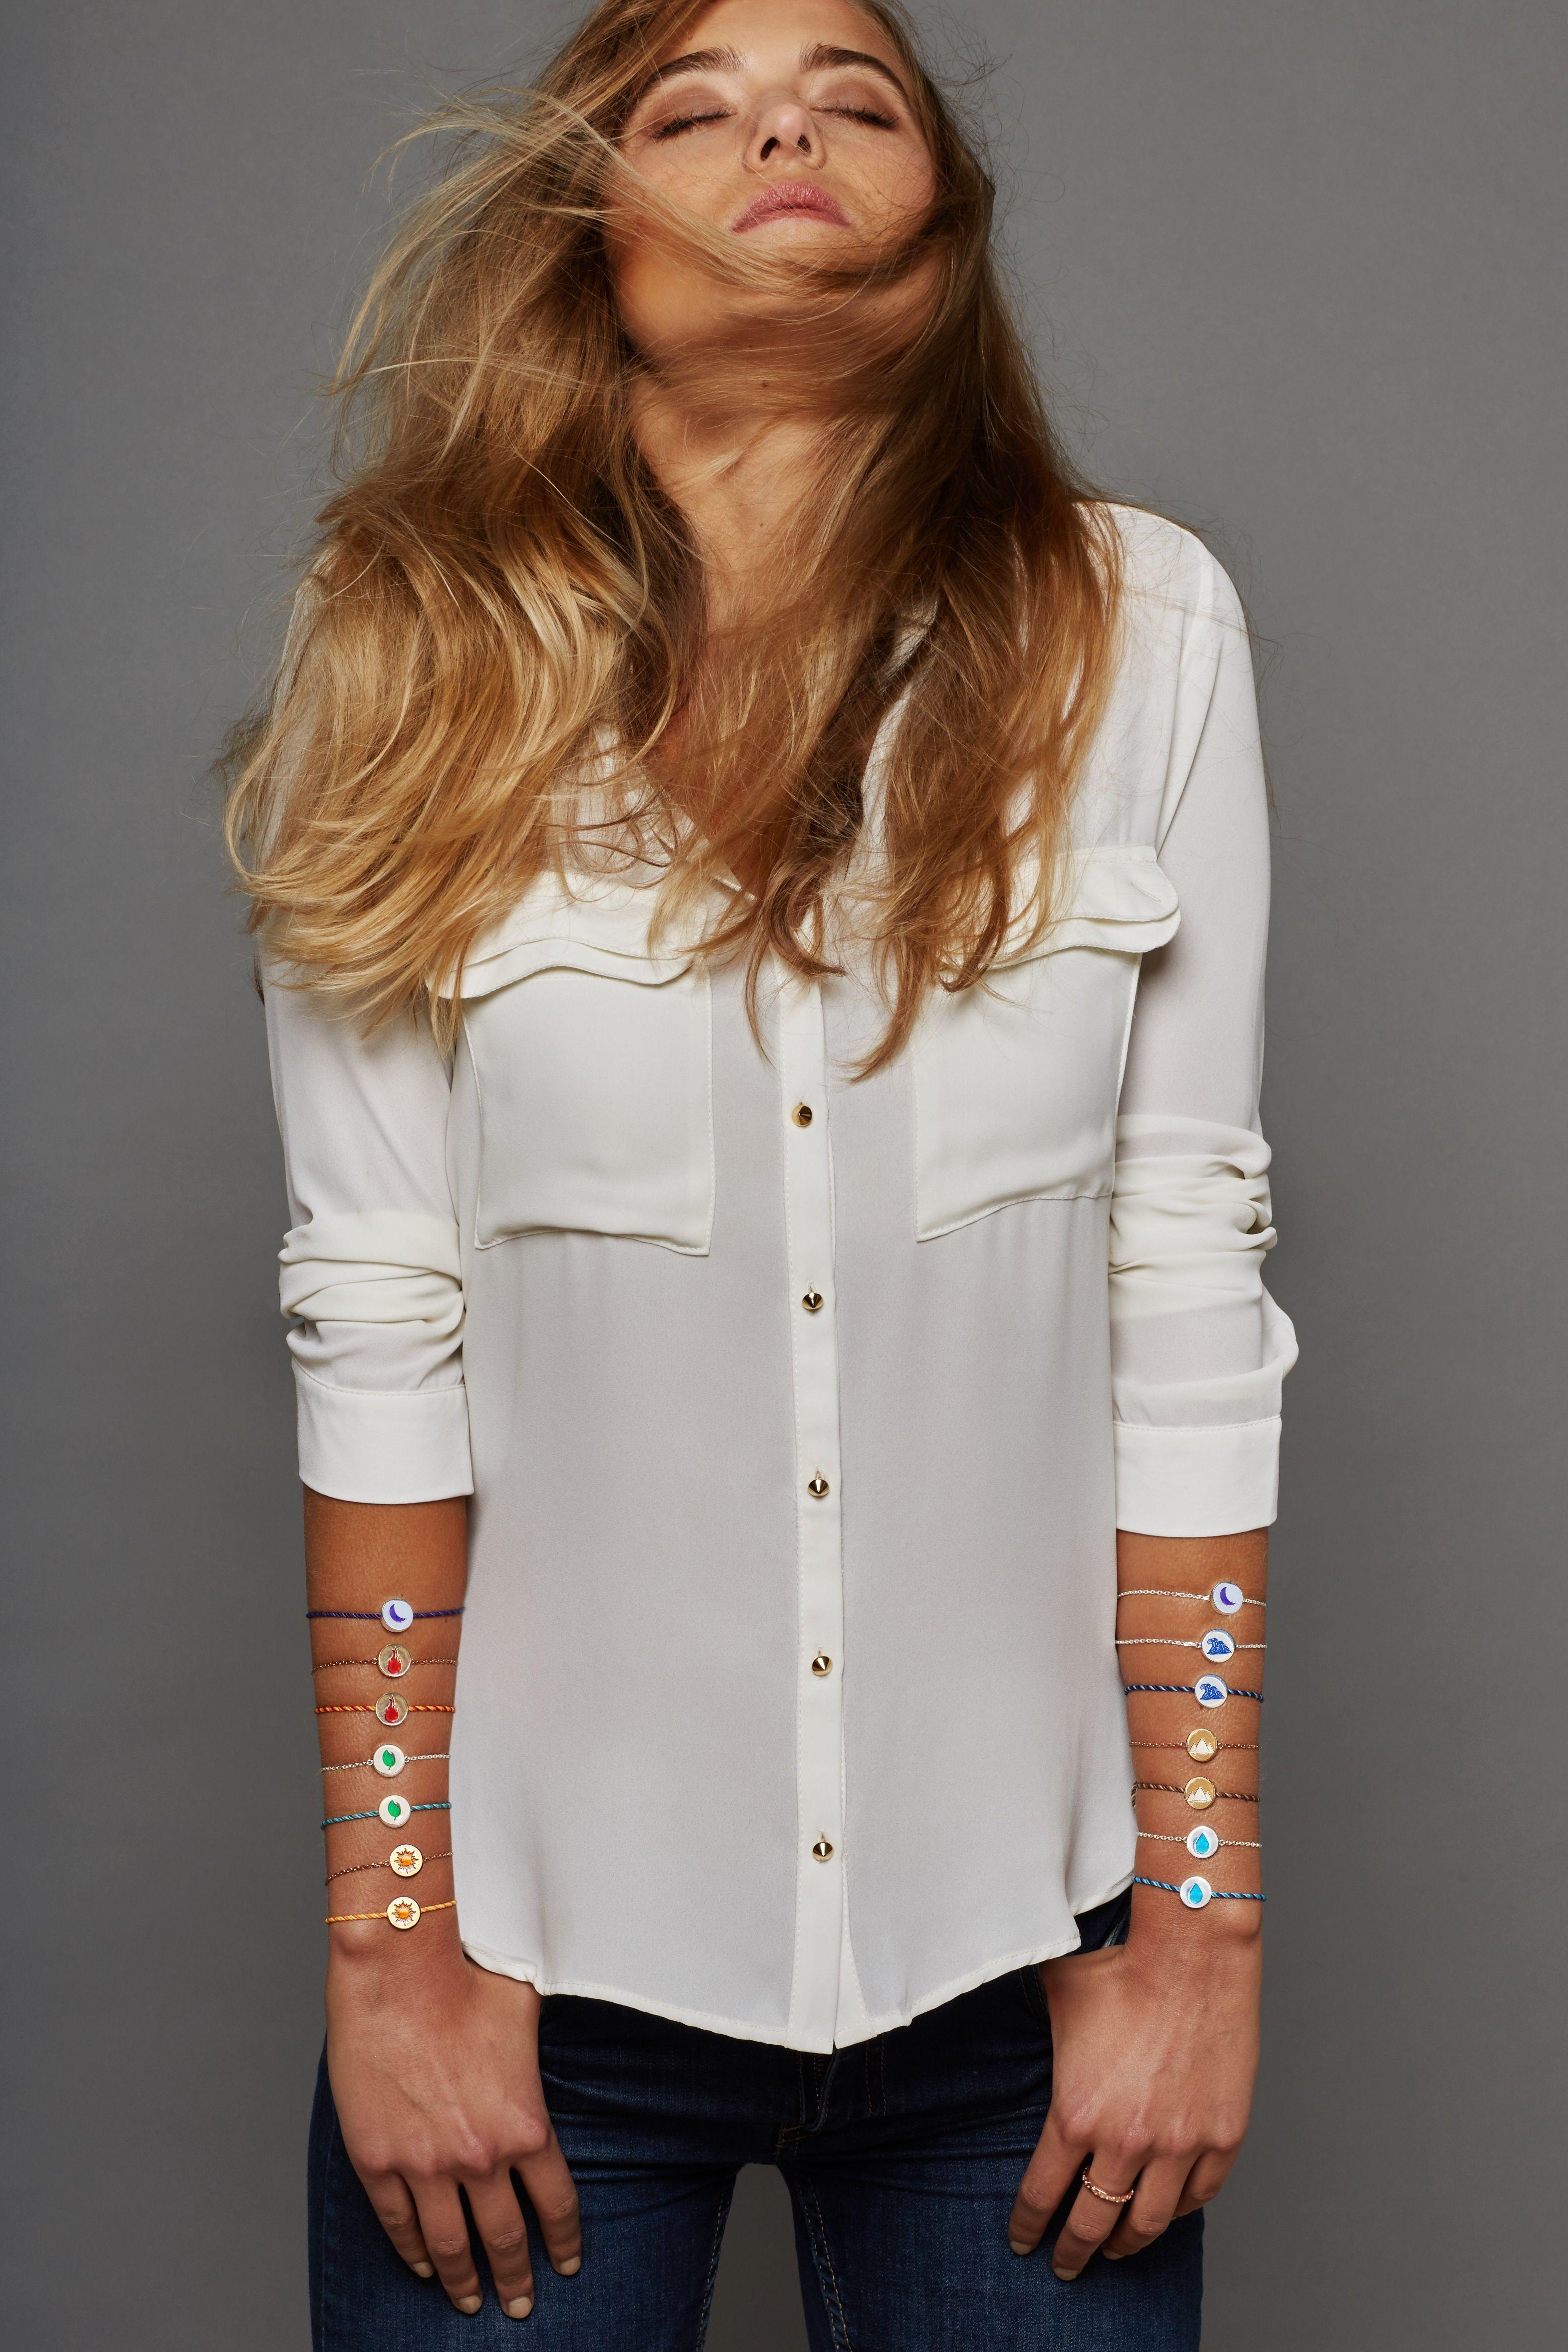 Chavin Jewellery